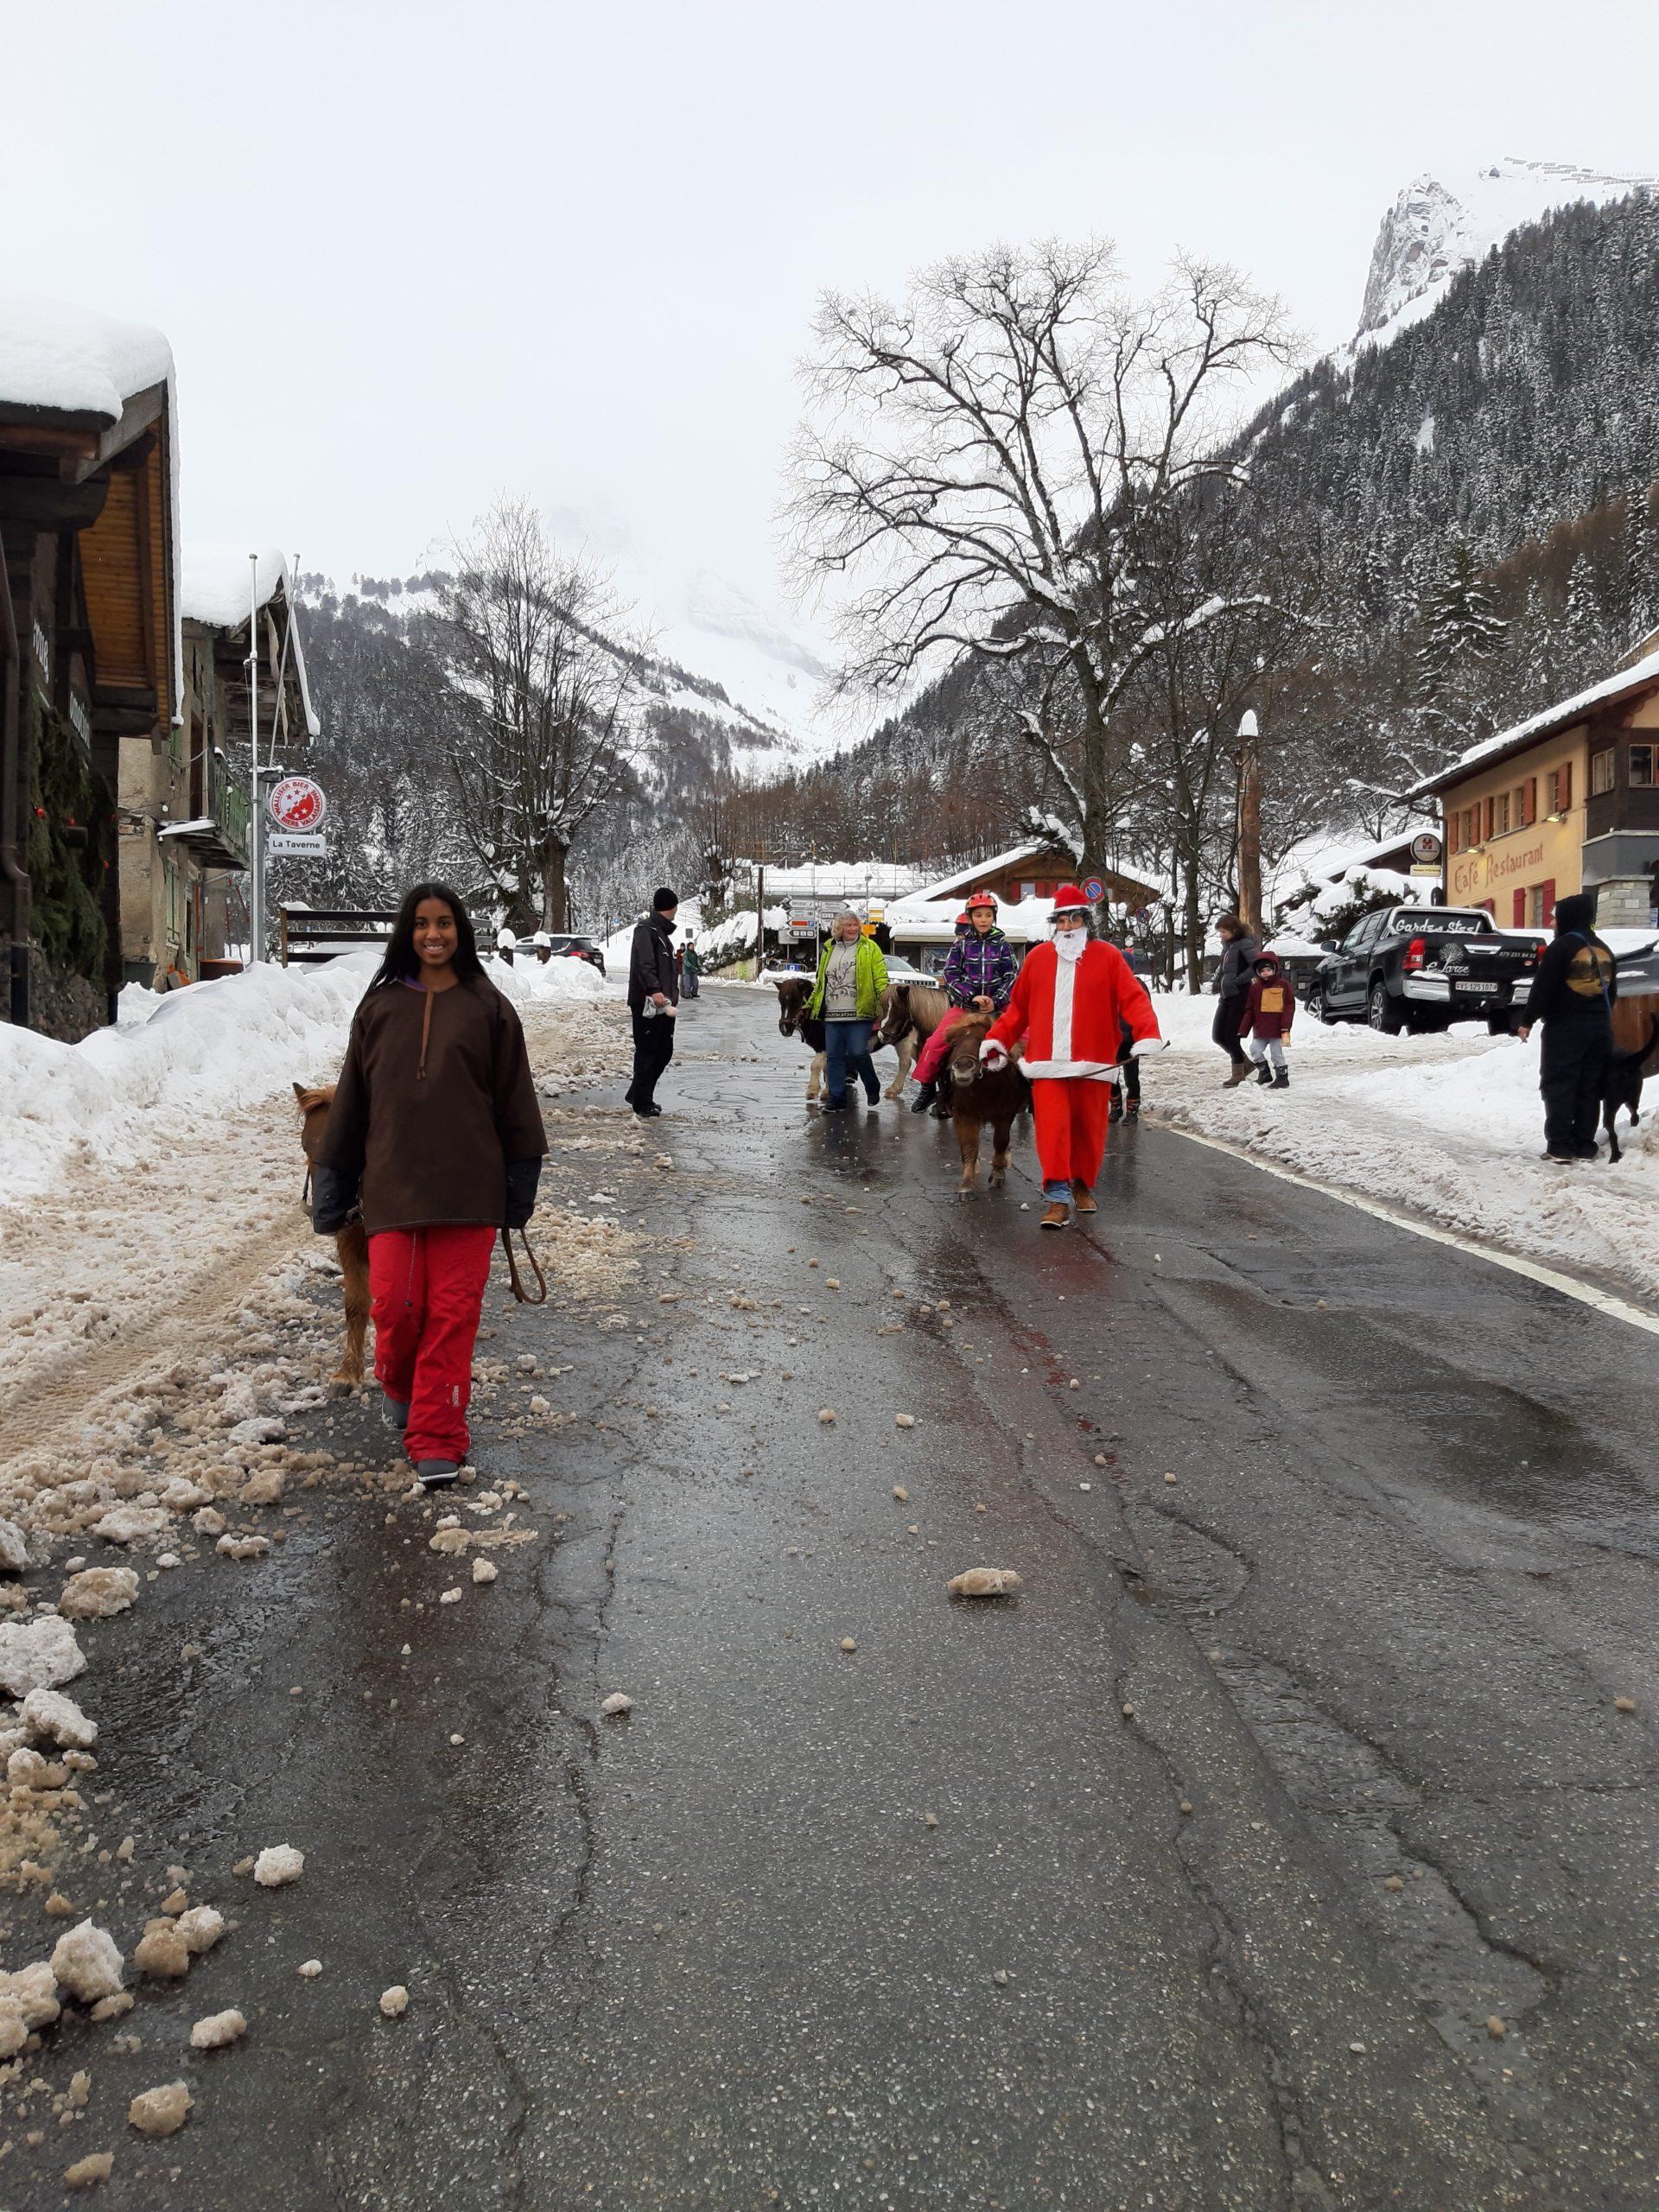 Visit of Santa Claus